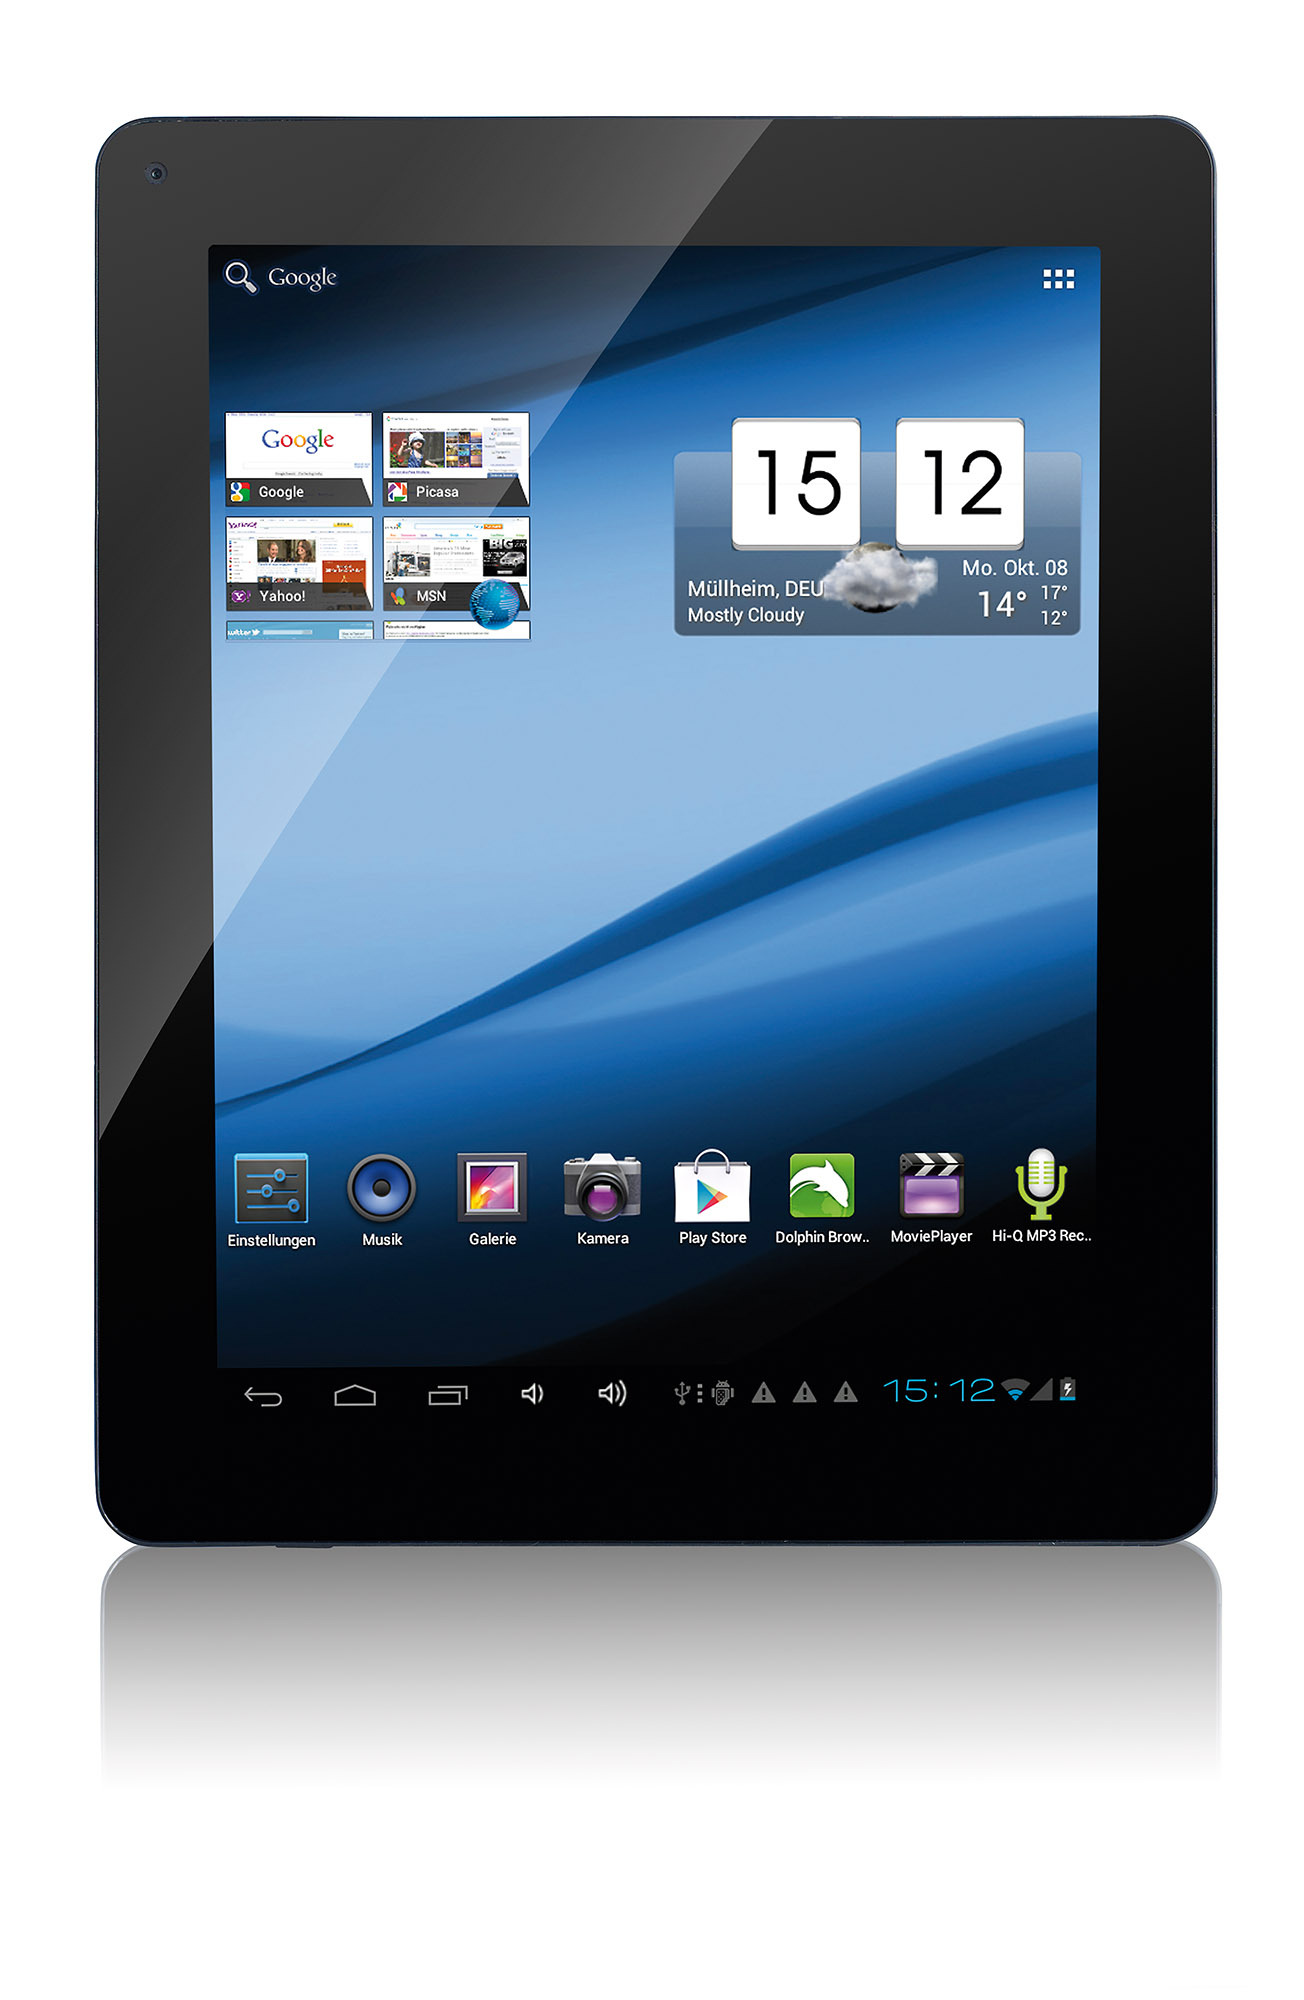 touchlet 9 7 tablet pc android 4 1 gps bt. Black Bedroom Furniture Sets. Home Design Ideas